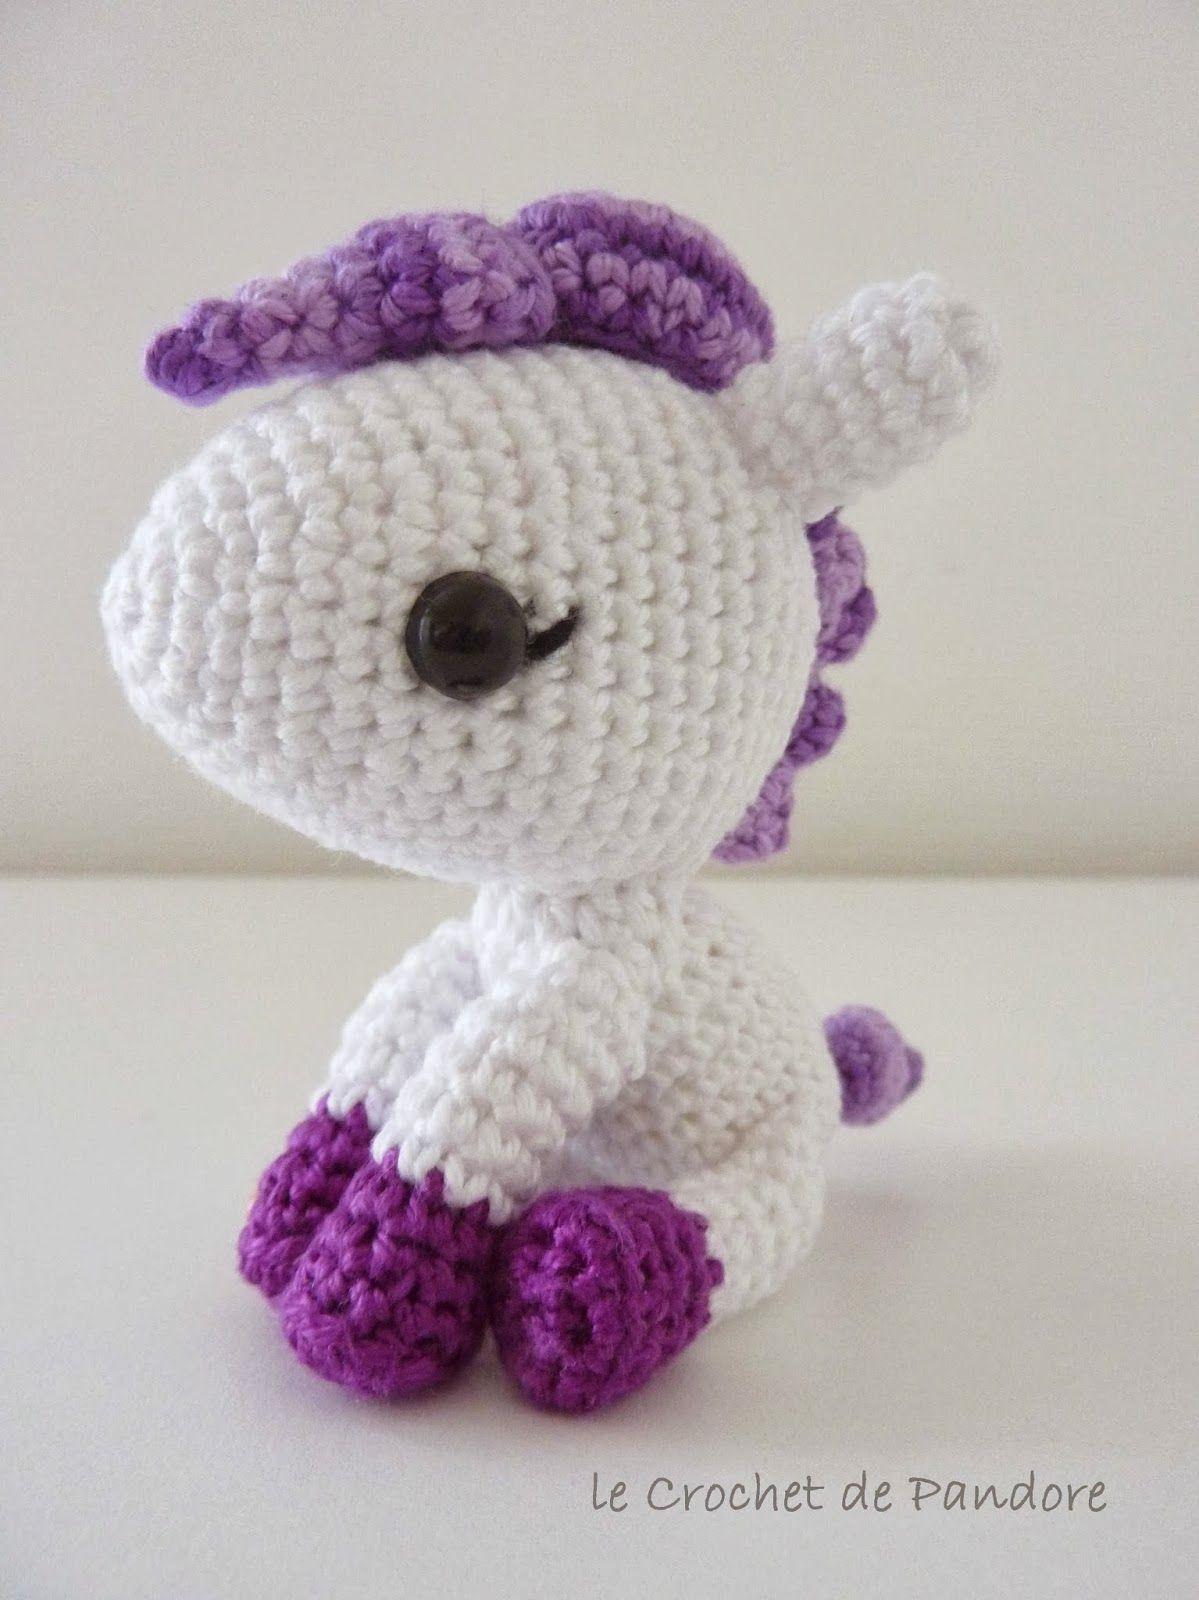 le Crochet de Pandore: Tutos crochet gratuits … | Pinteres…